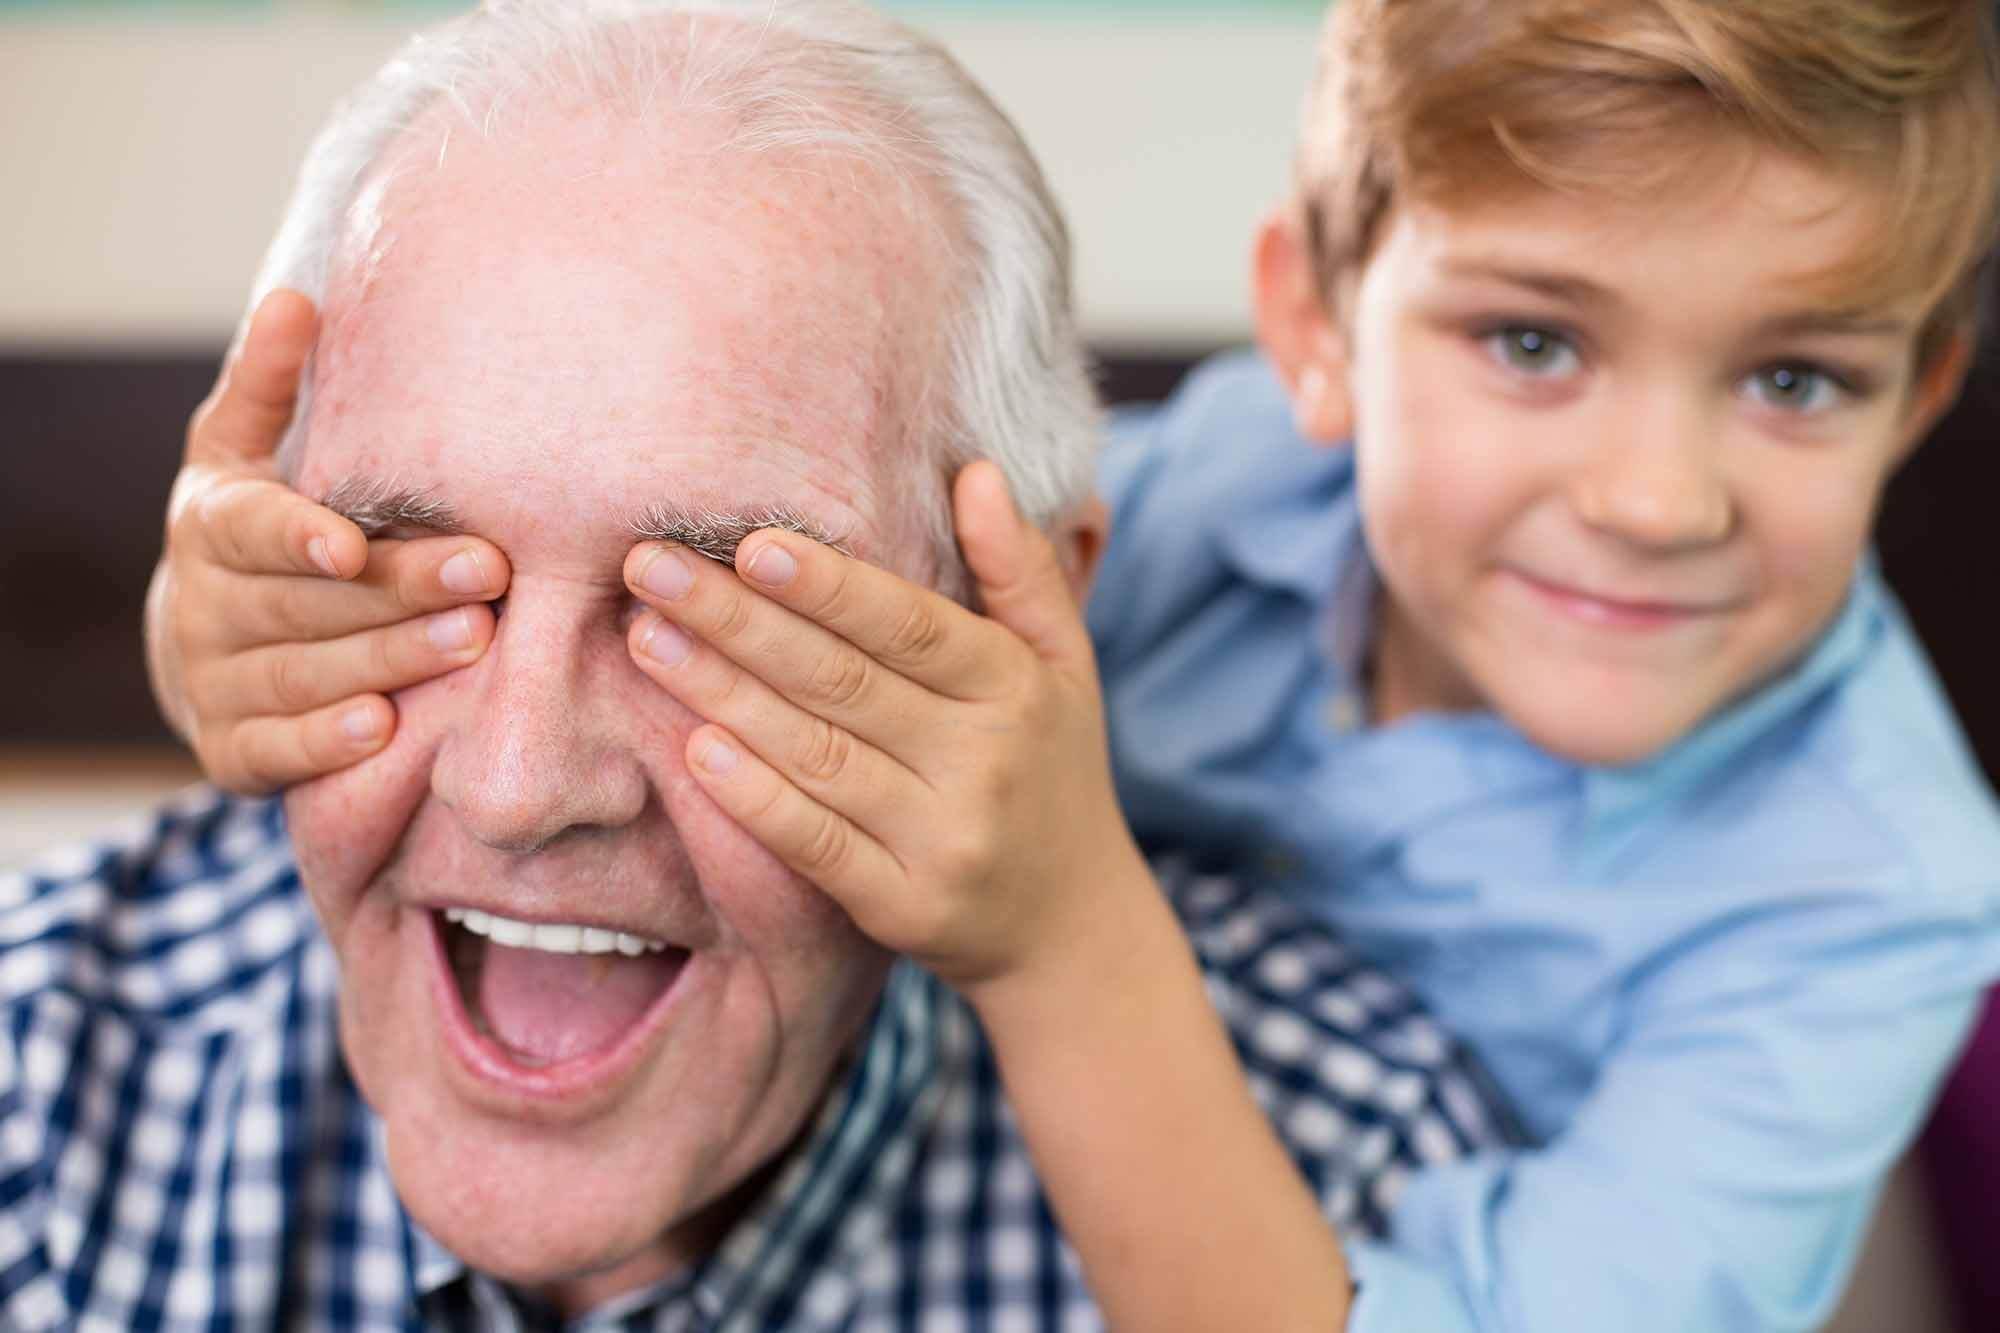 kakek nenek ikut mengasuh anak